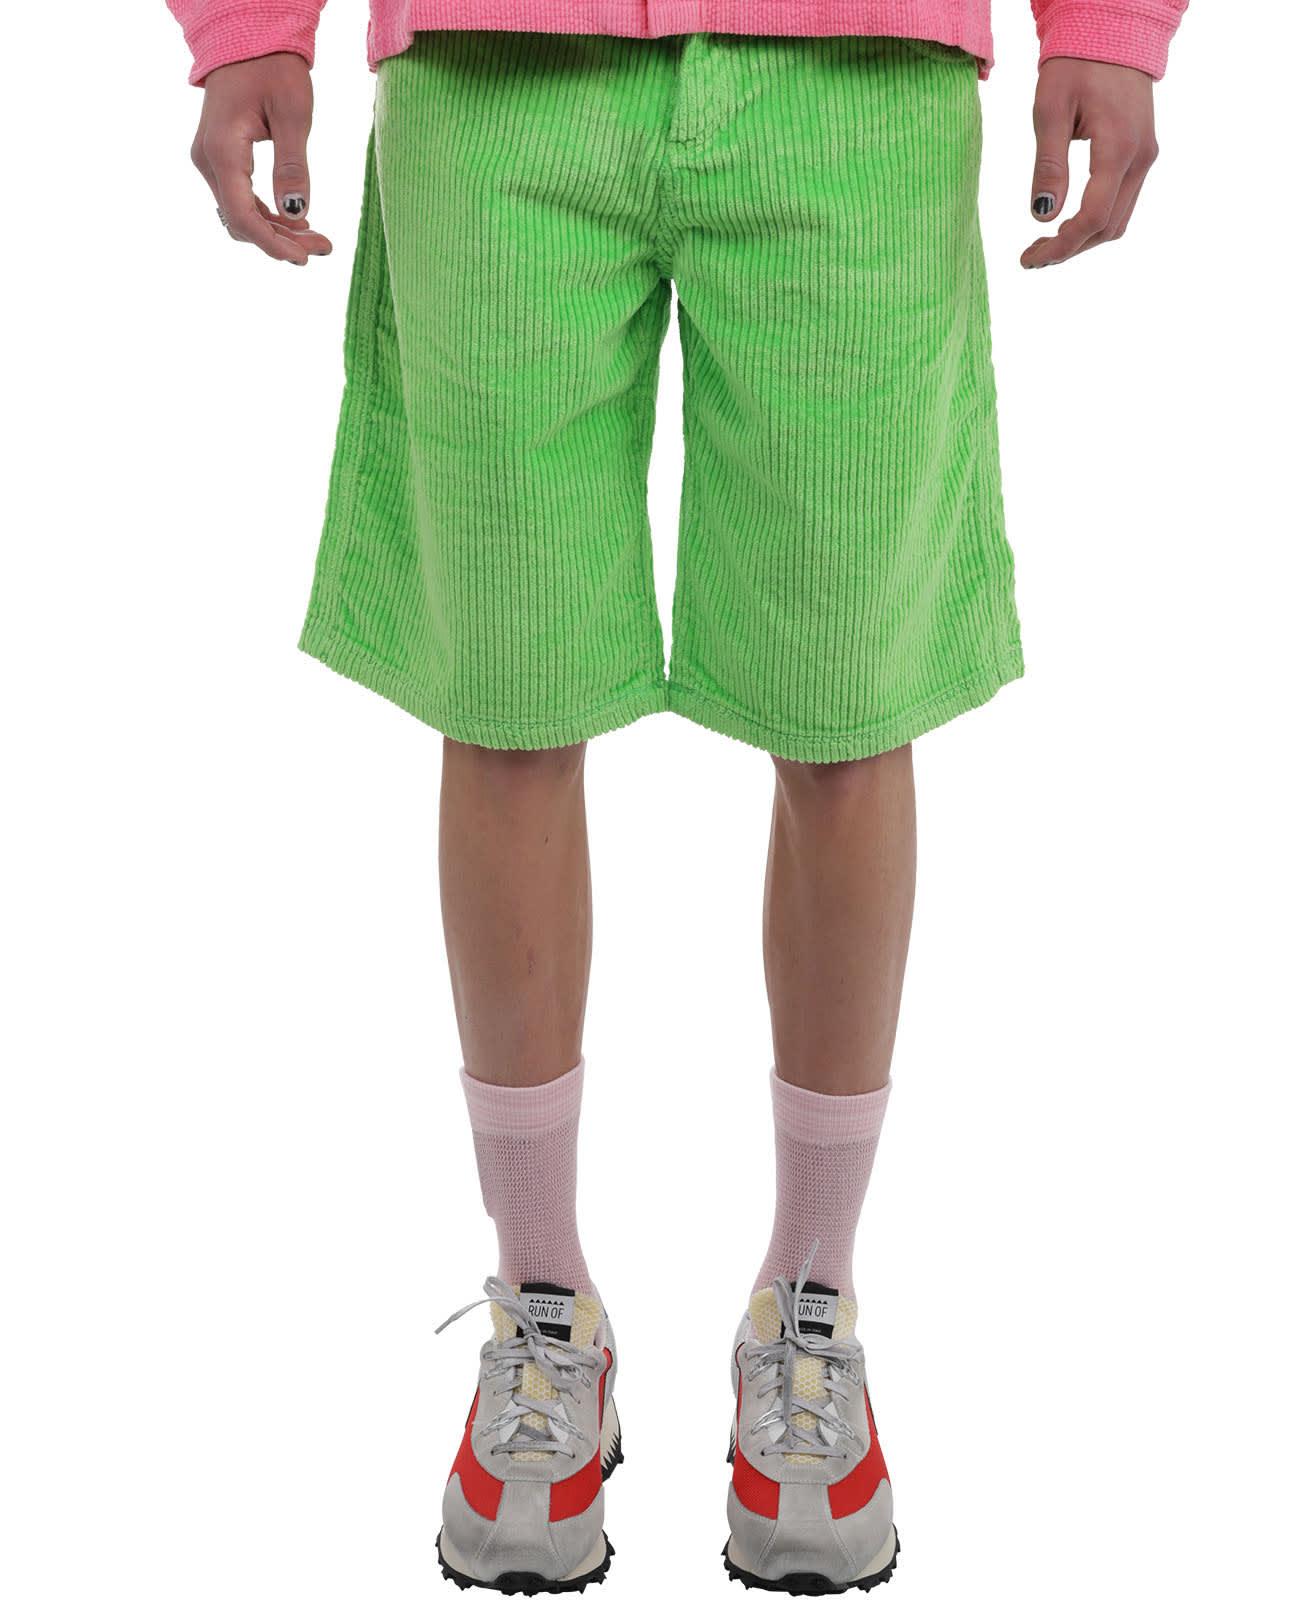 Erl Clothing ERL GREEN CORD BERMUDAS